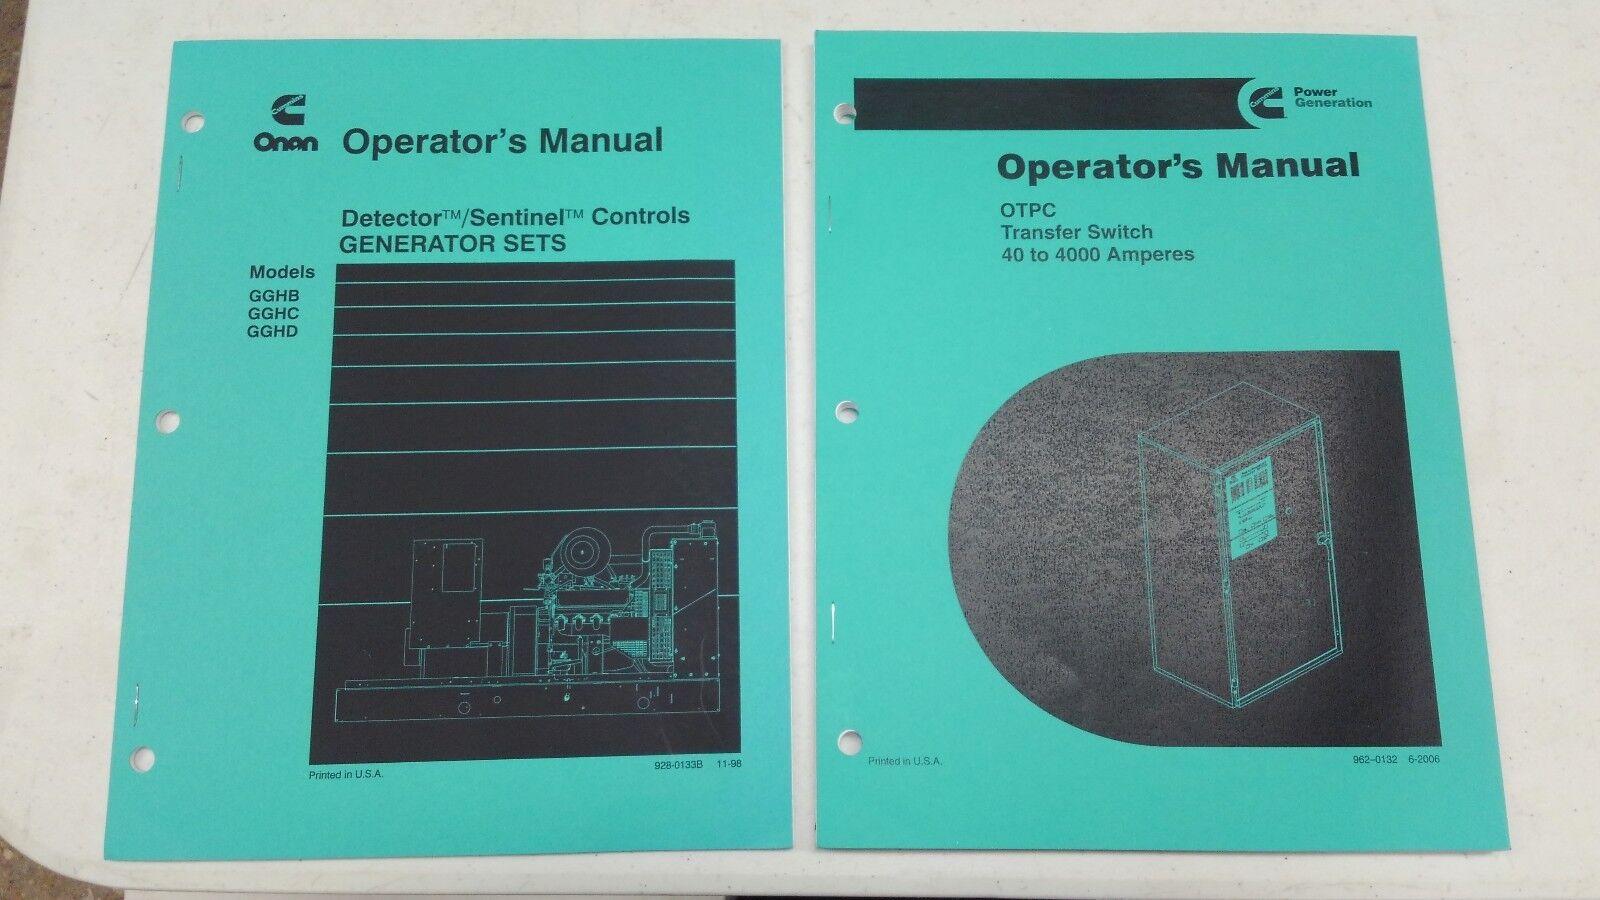 Otpcc Manual Electronics Hobby Circuits For Beginner39s February 2012 Otpc Not Recording Transfer Test Array Onan Operator U0027s Manuals Switch 40 To 4000 Amps Gghb Gghc Rh Ebay